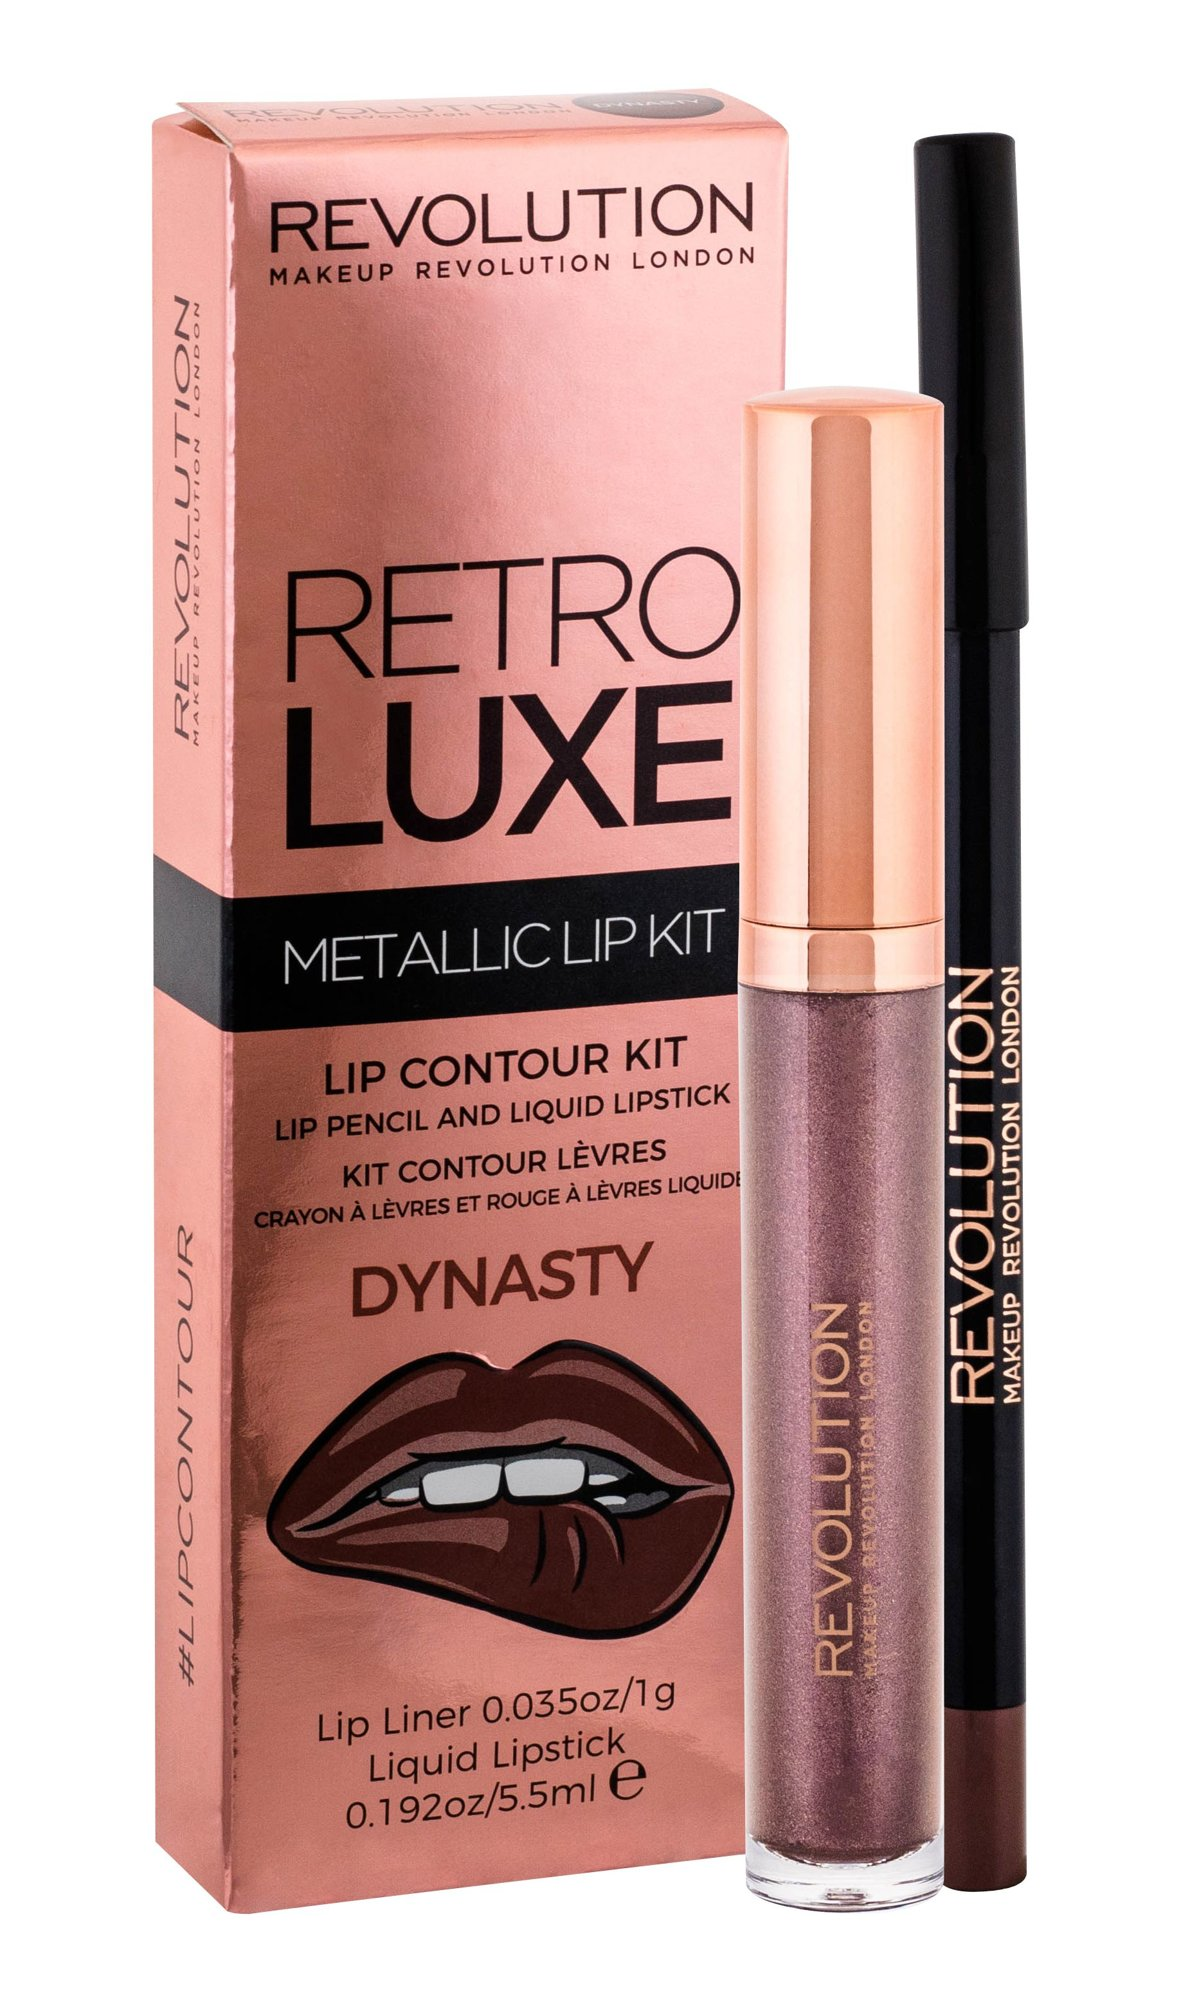 Makeup Revolution London Retro Luxe Lipstick 5,5ml Dynasty